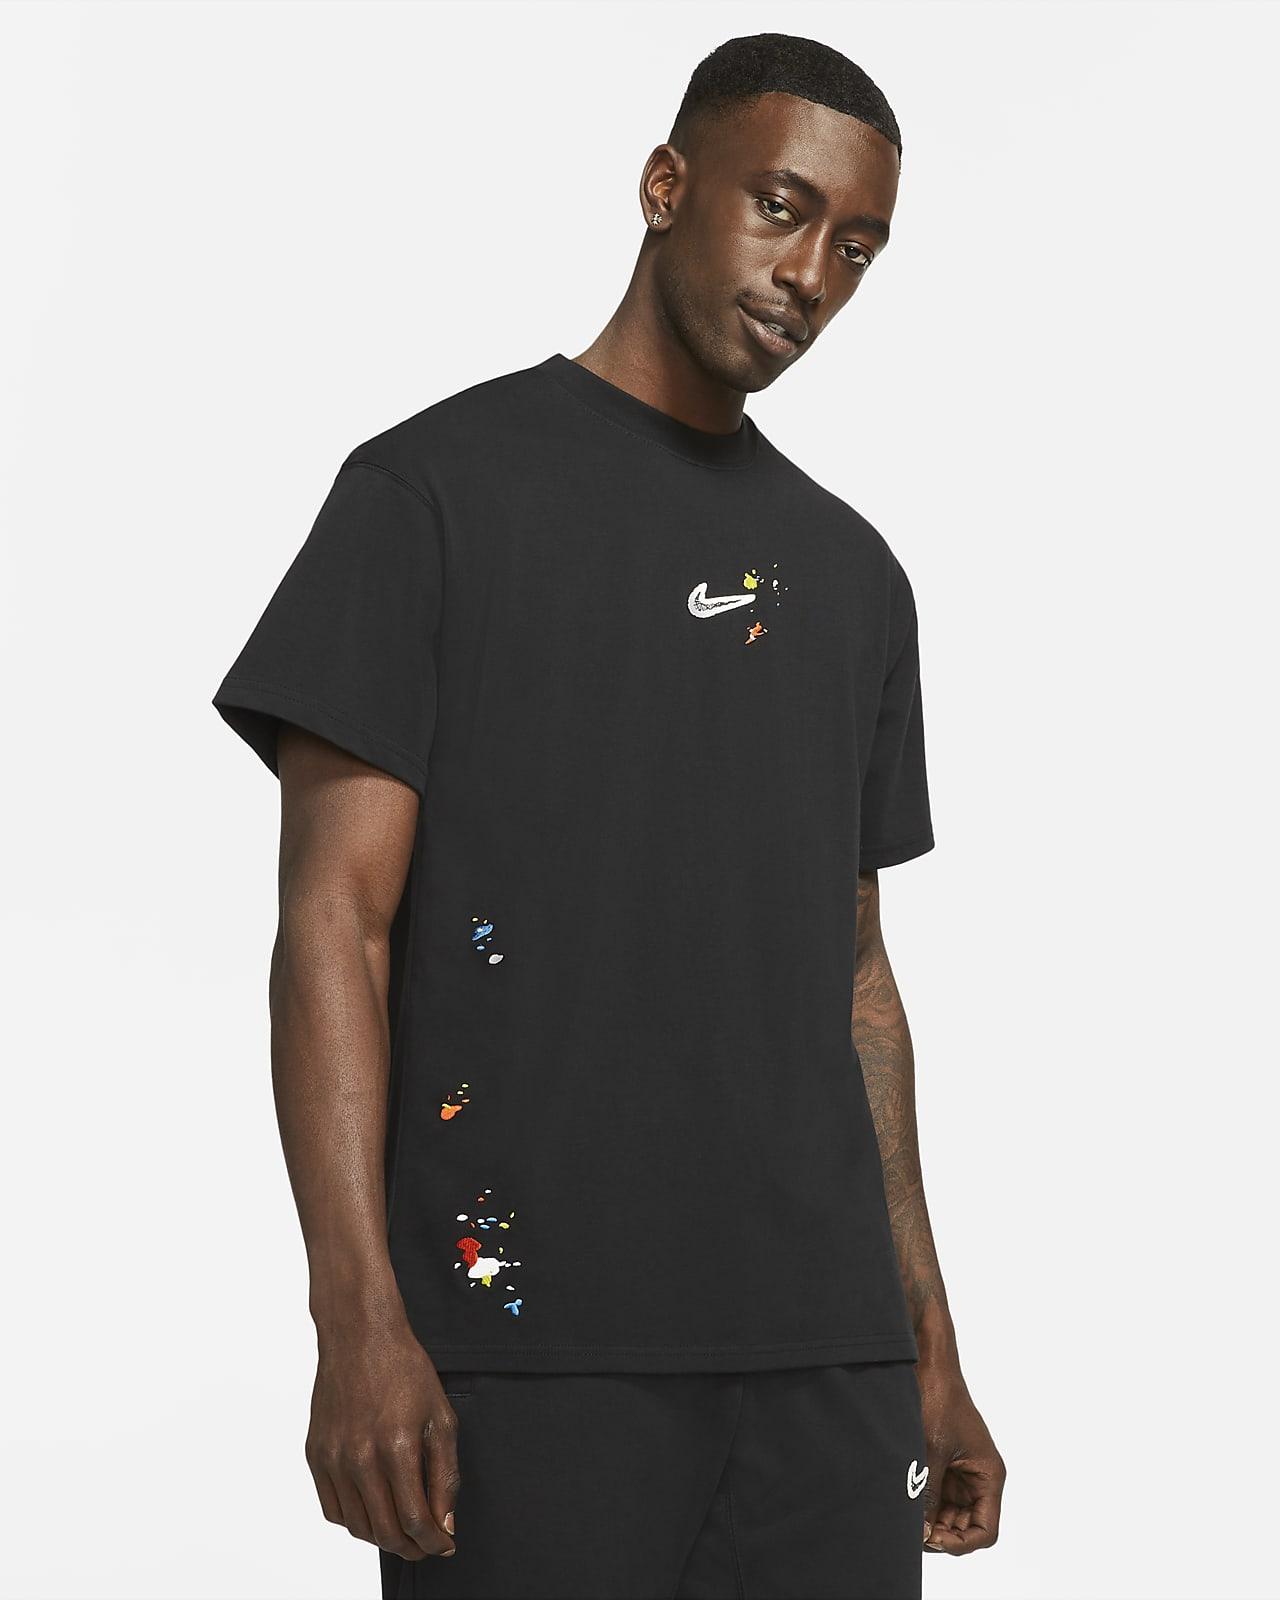 Nike Sportswear Men's Max 90 T-Shirt